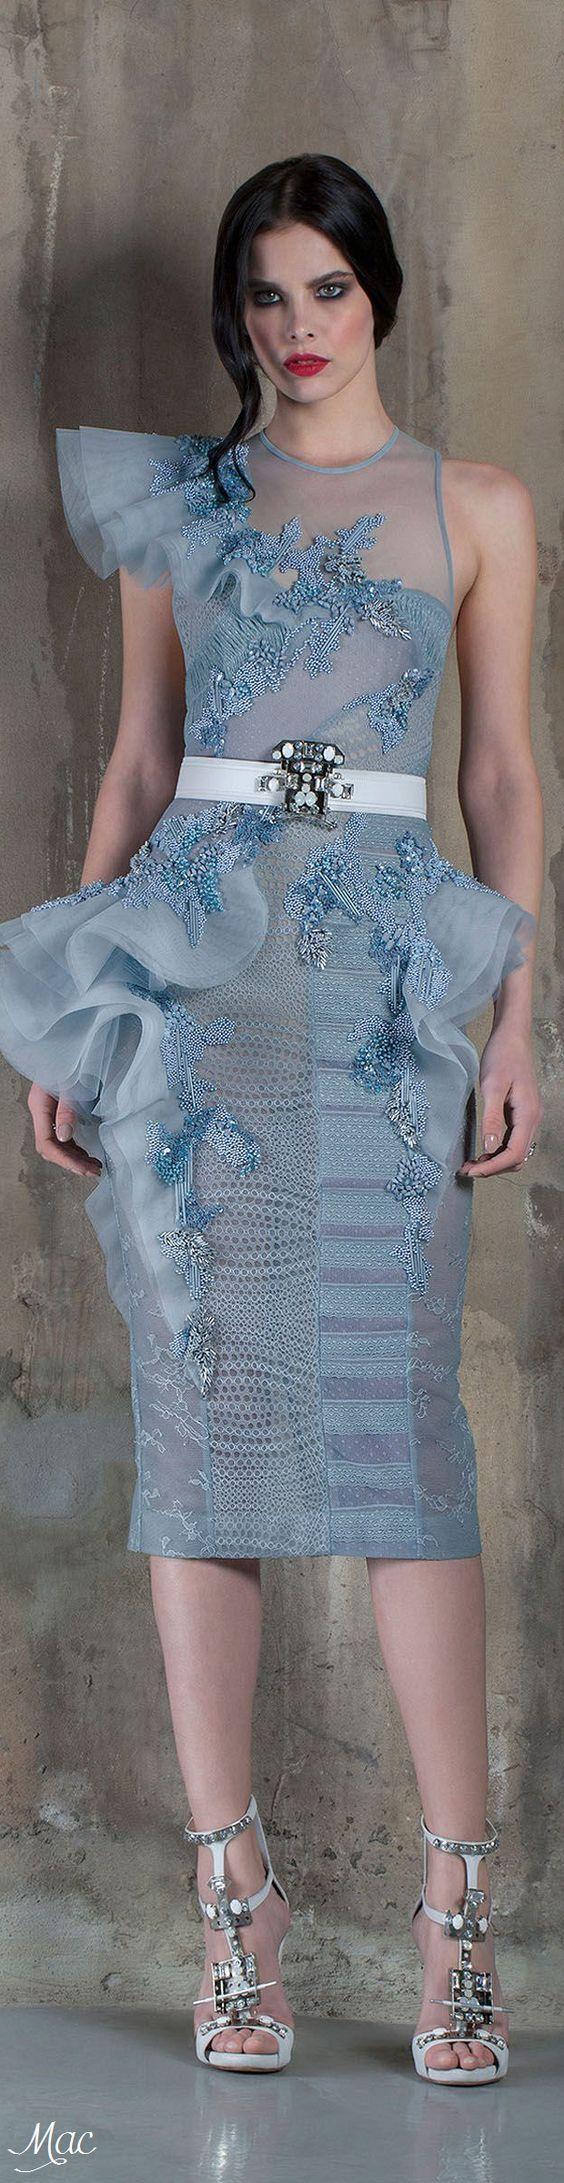 Spring 2016 Haute Couture Basil Soda: